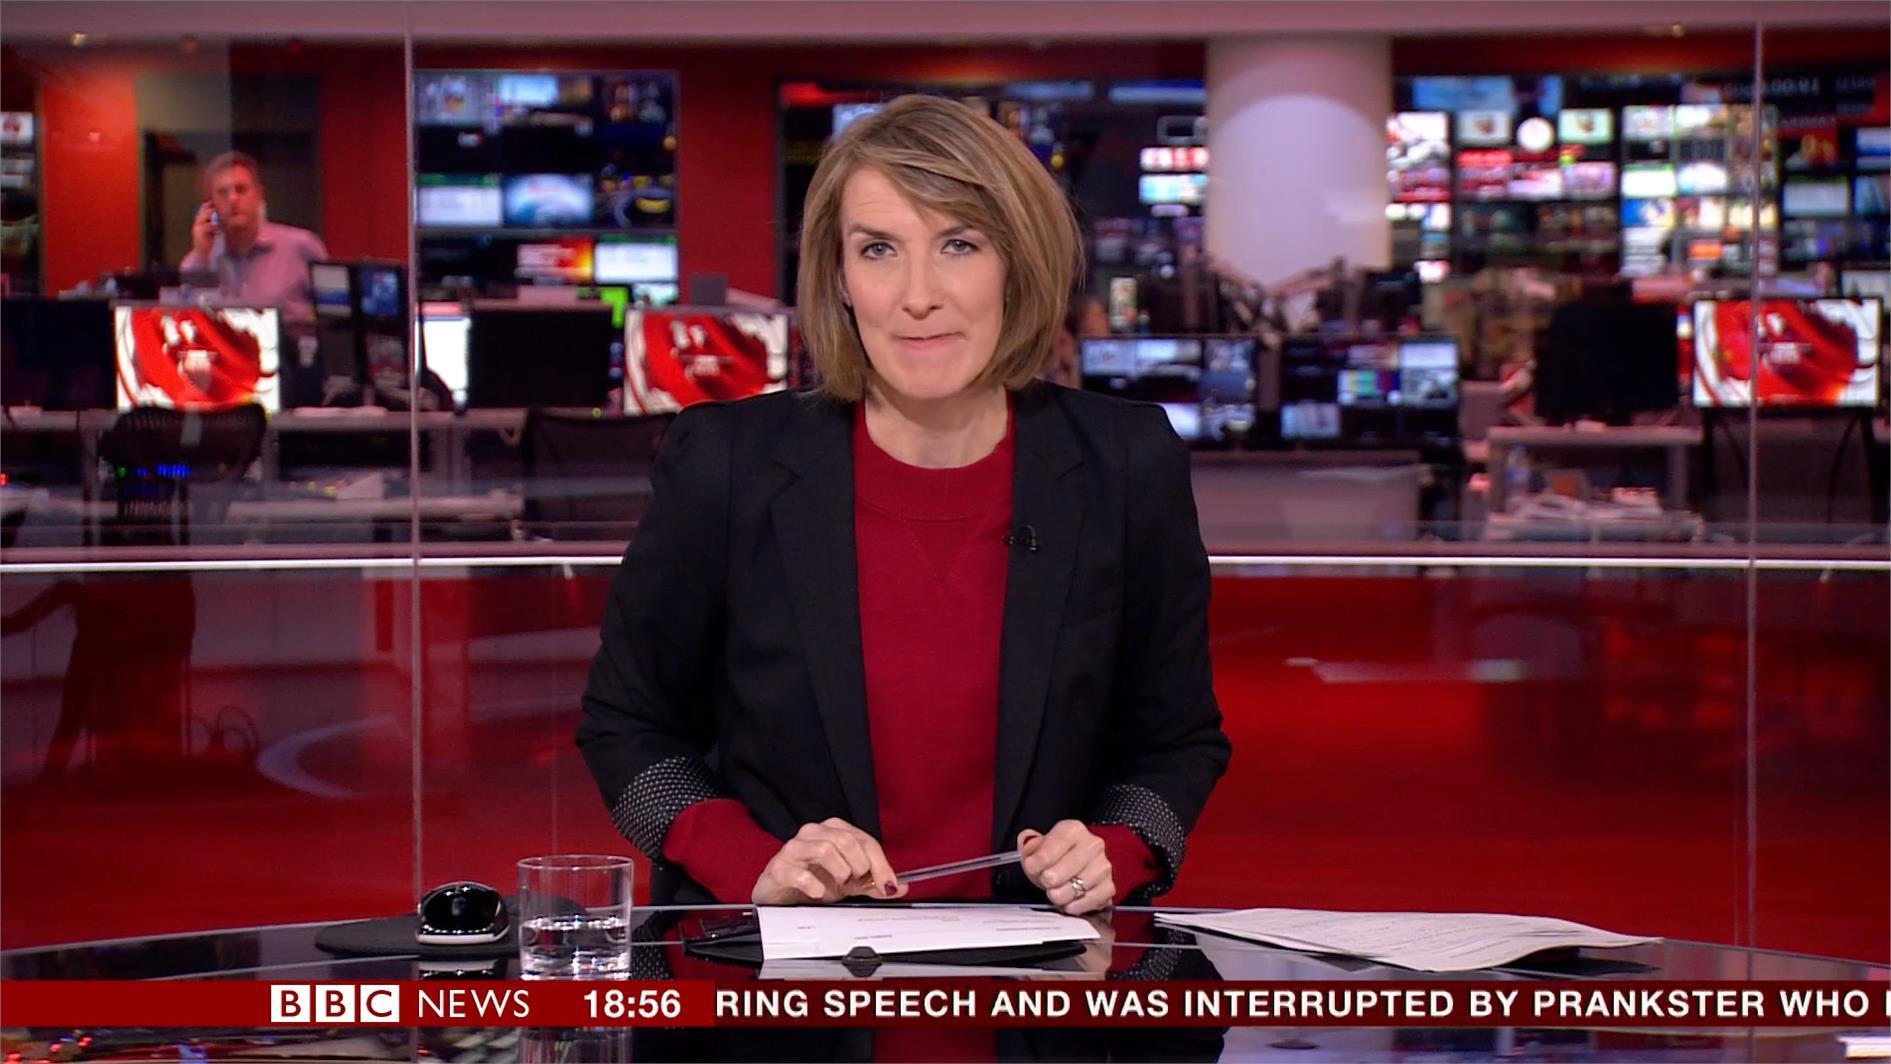 Rachel Schofield - BBC News Presenter (4)